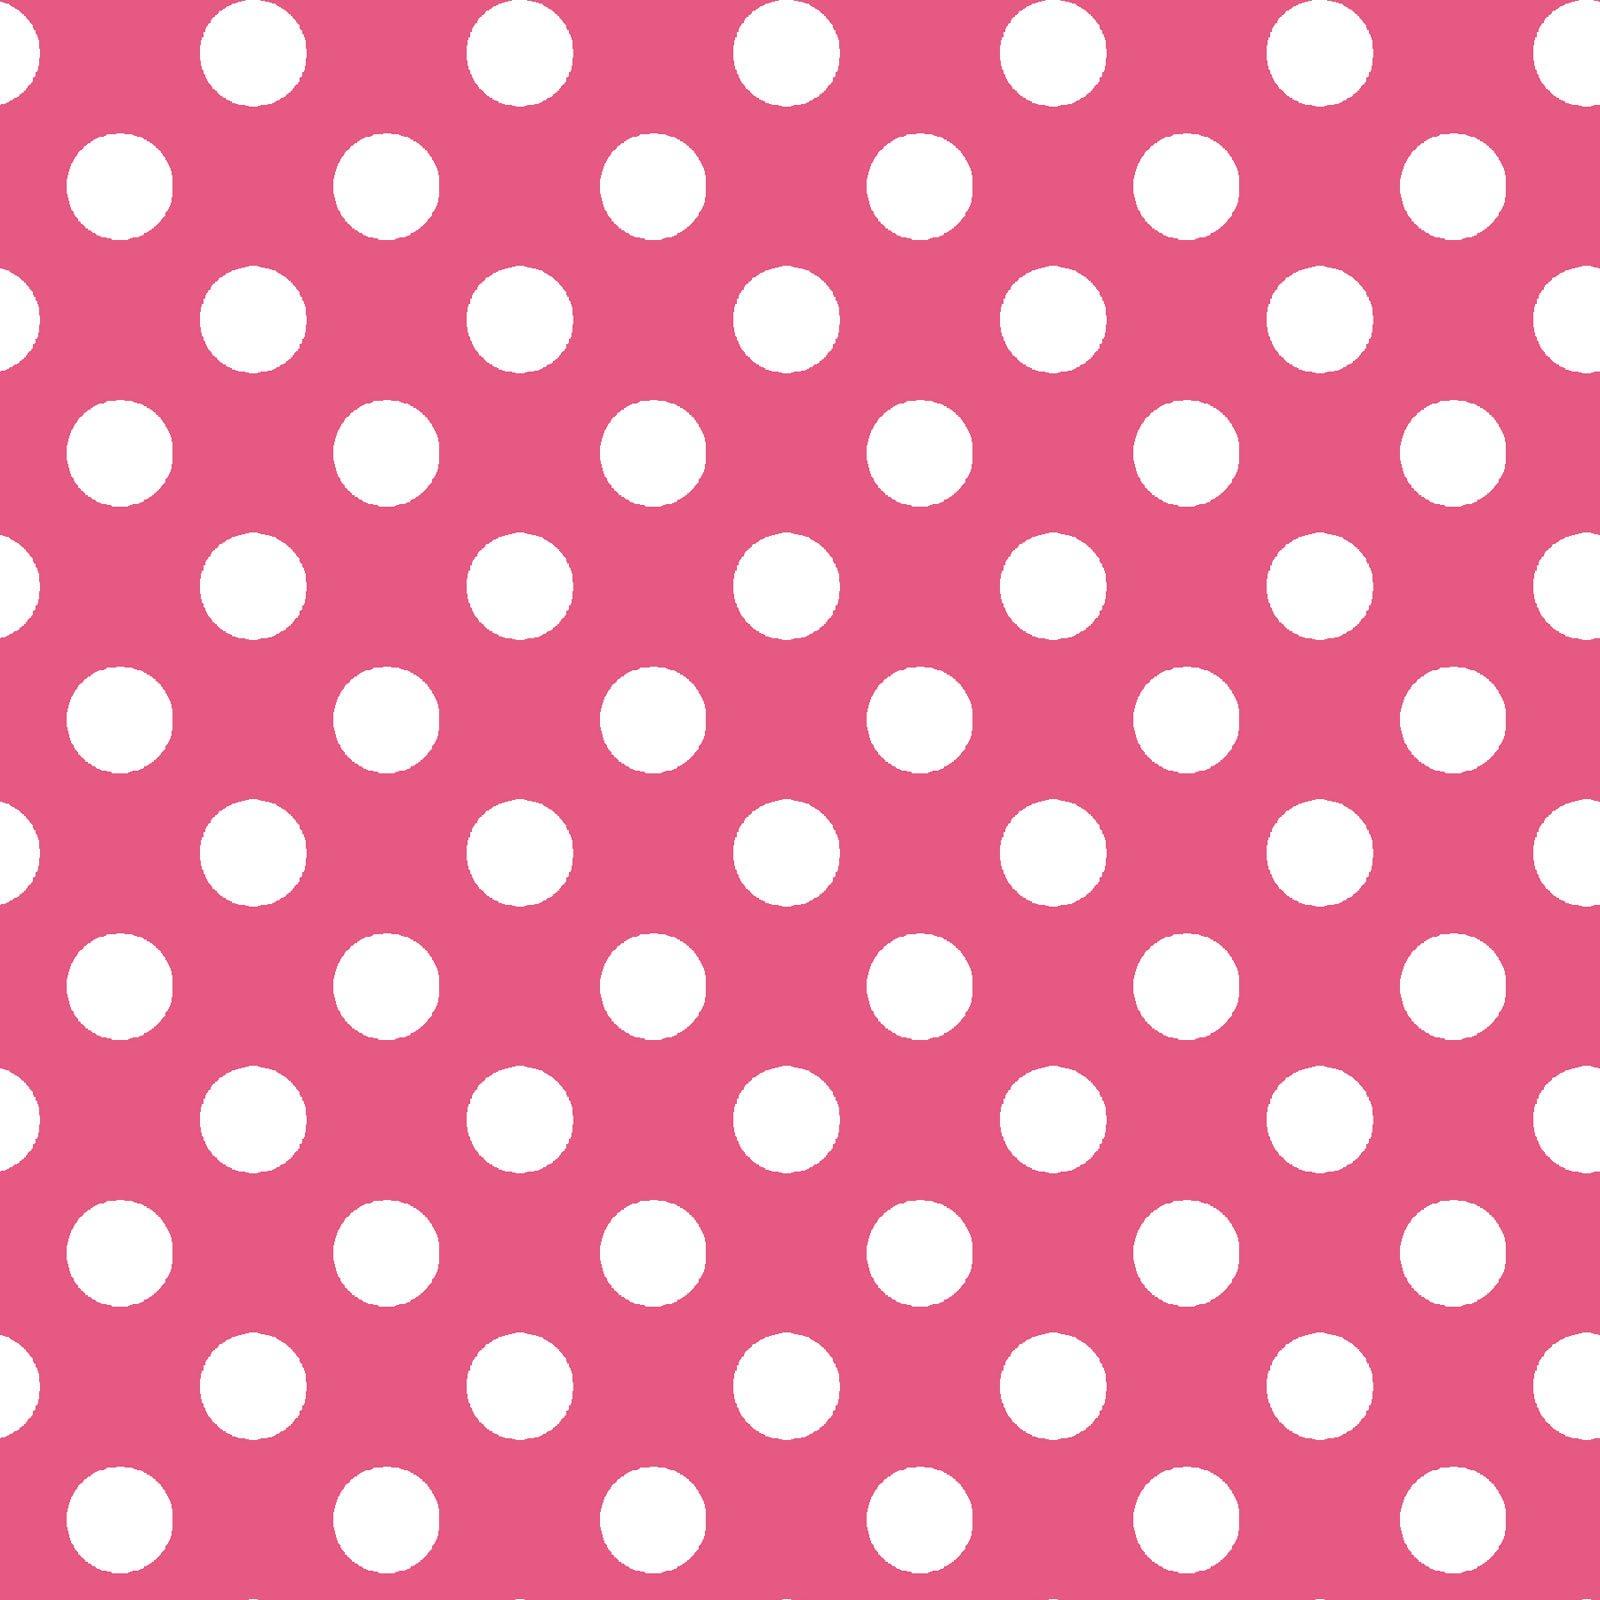 KimberBell Basics Pink Dots 8216M-P